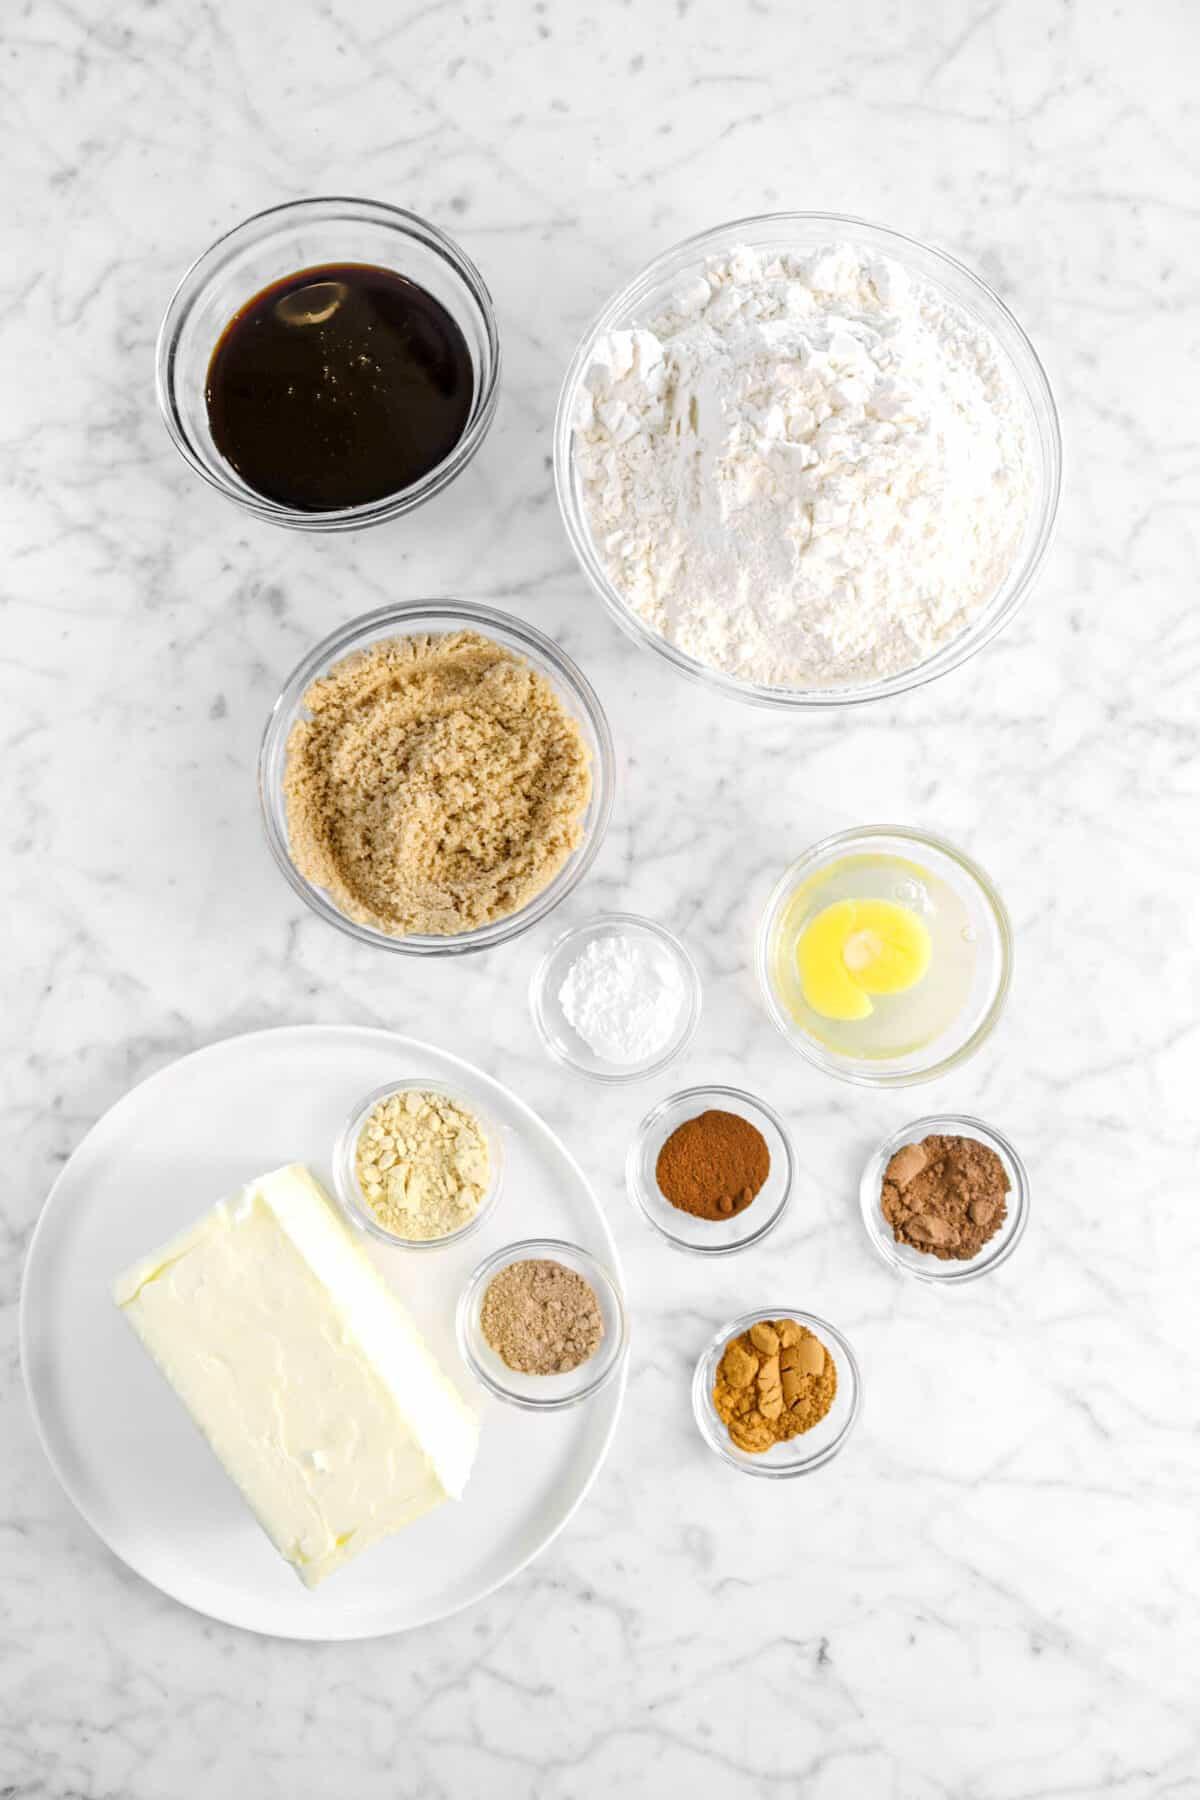 molasses, flour, brown sugar, egg, butter, baking soda, cloves, nutmeg, cinnamon, ginger, and allspice in glass bowls on marble counter